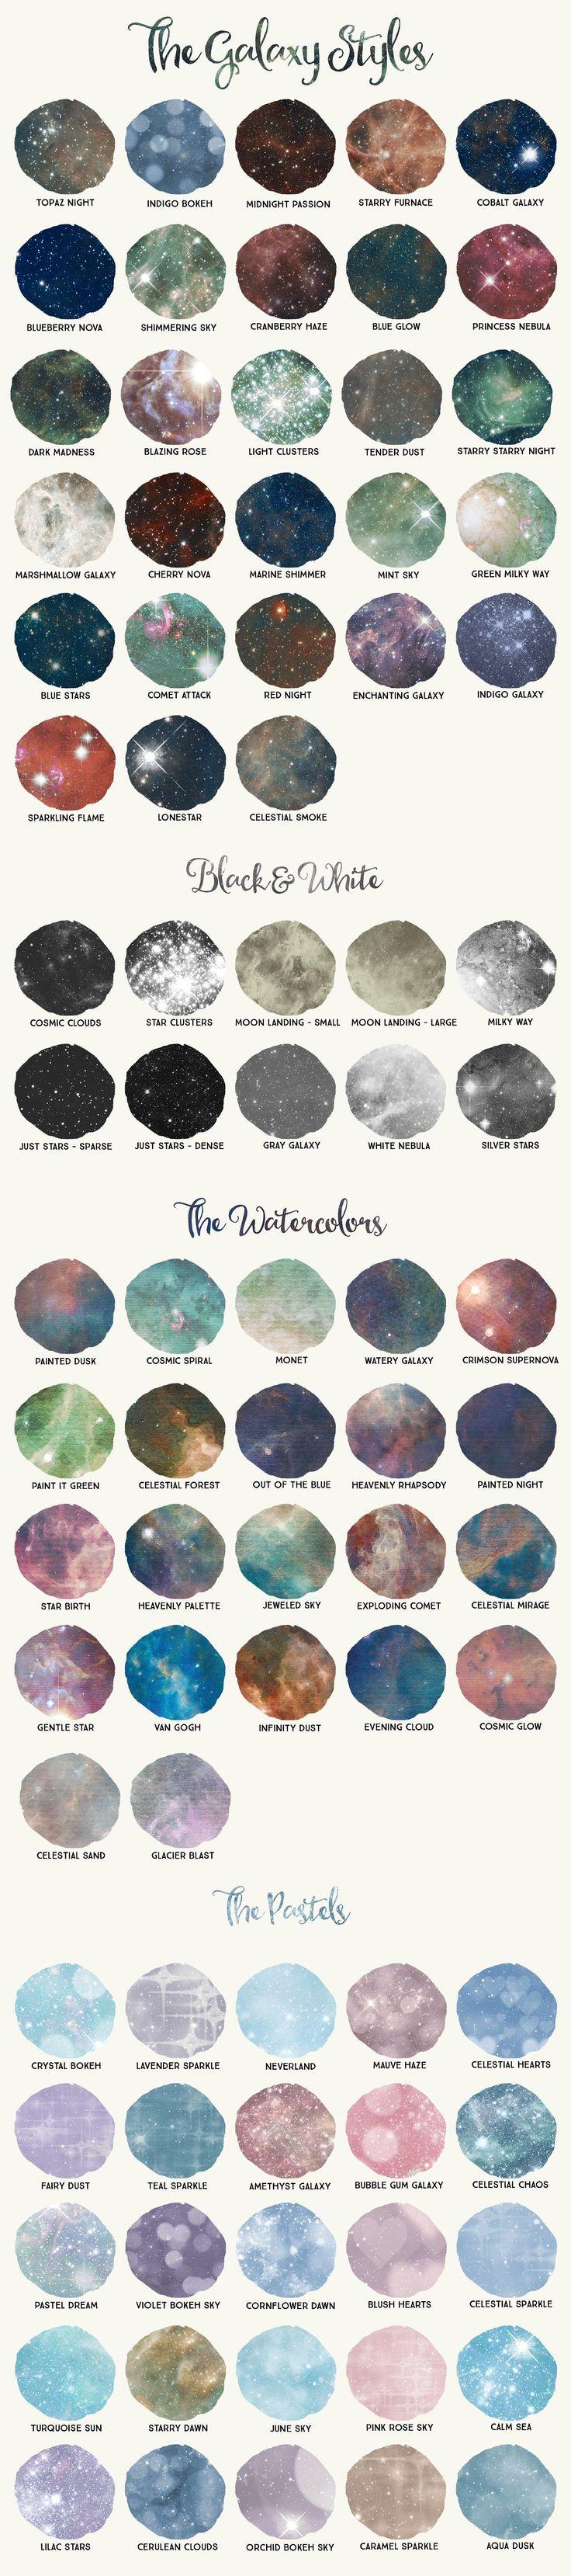 Galaxy Design Kit for Illustrator by Alaina Jensen on @creativemarket